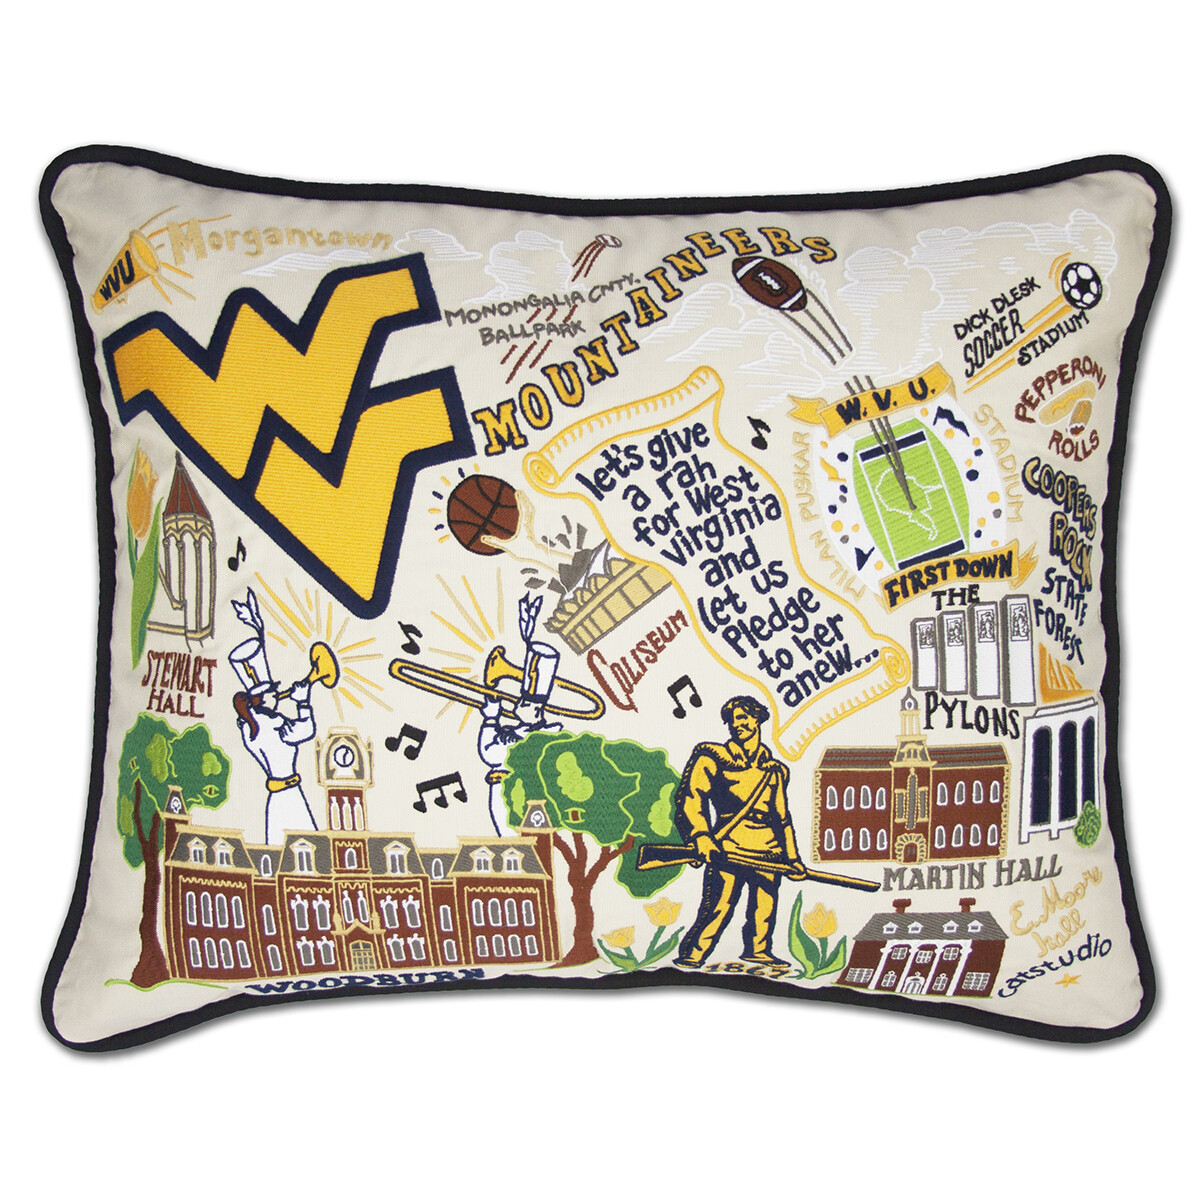 Catstudio WVU Pillow Collegiate Collection